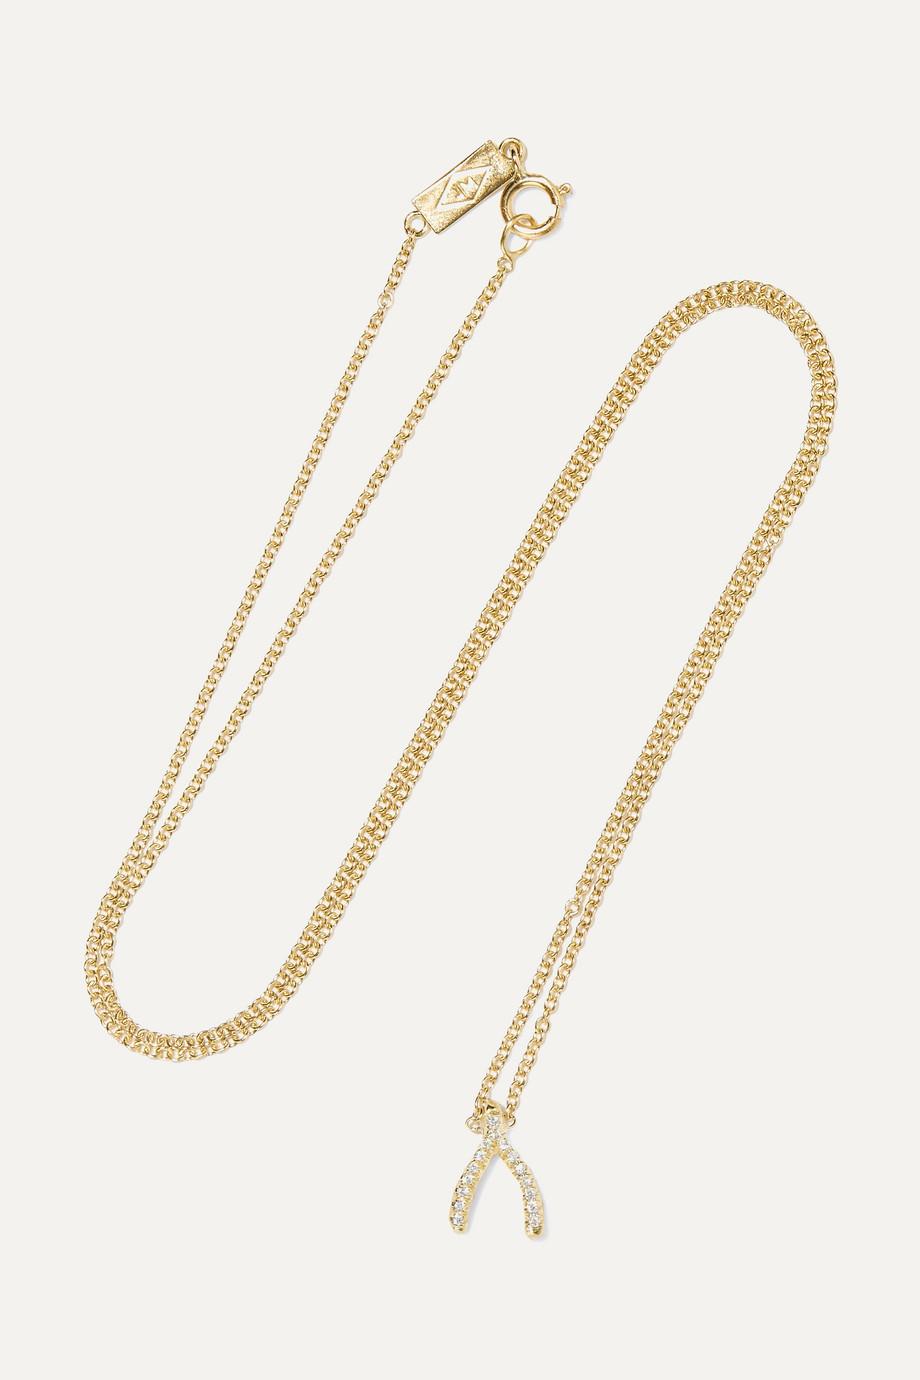 Jennifer Meyer Collier en or 18 carats et diamants Wishbone